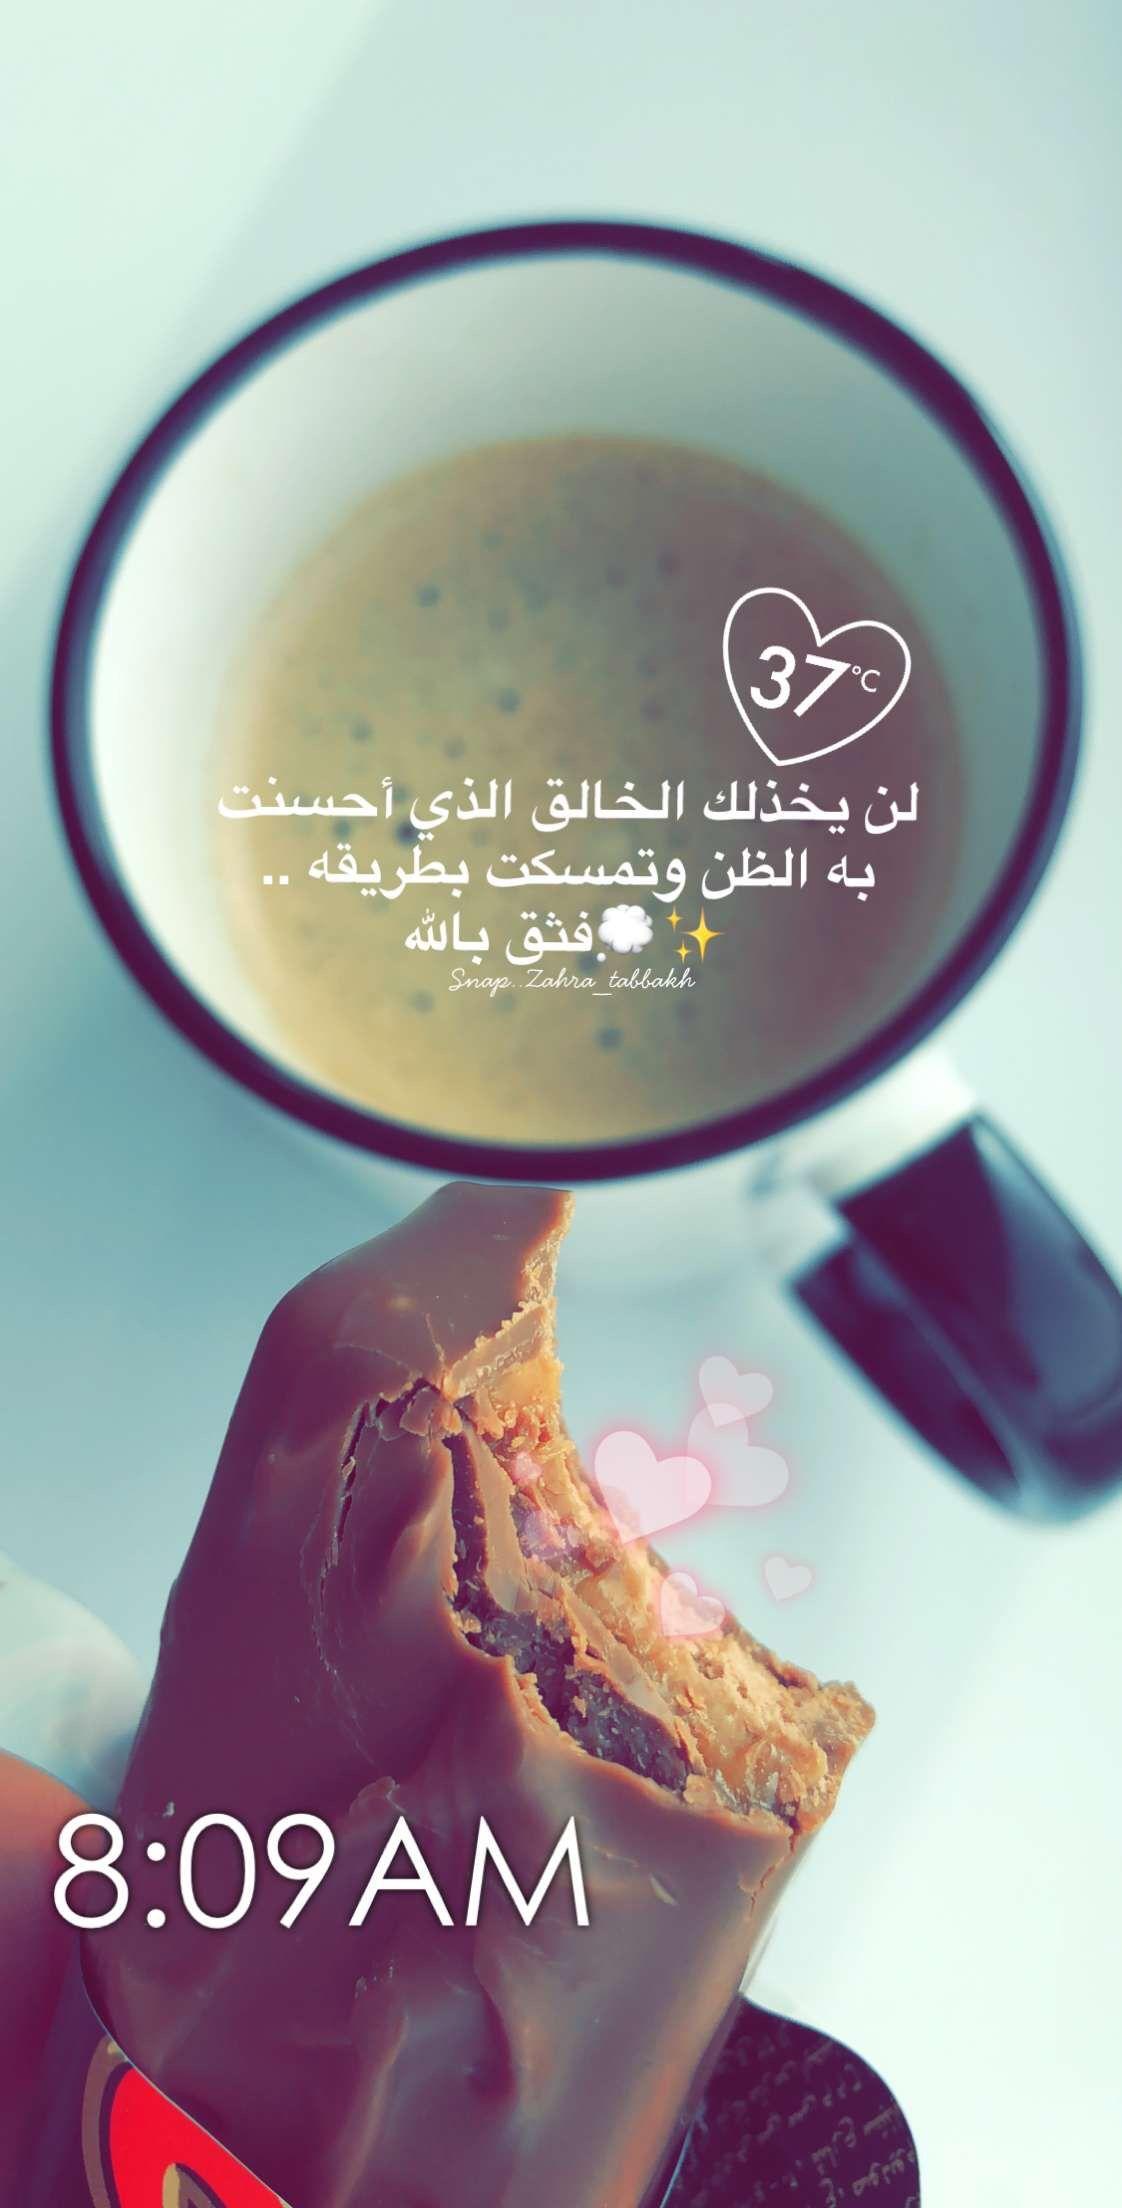 يارب استودعتك ايامي القادمة Beautiful Quran Quotes Funny Arabic Quotes Snapchat Quotes